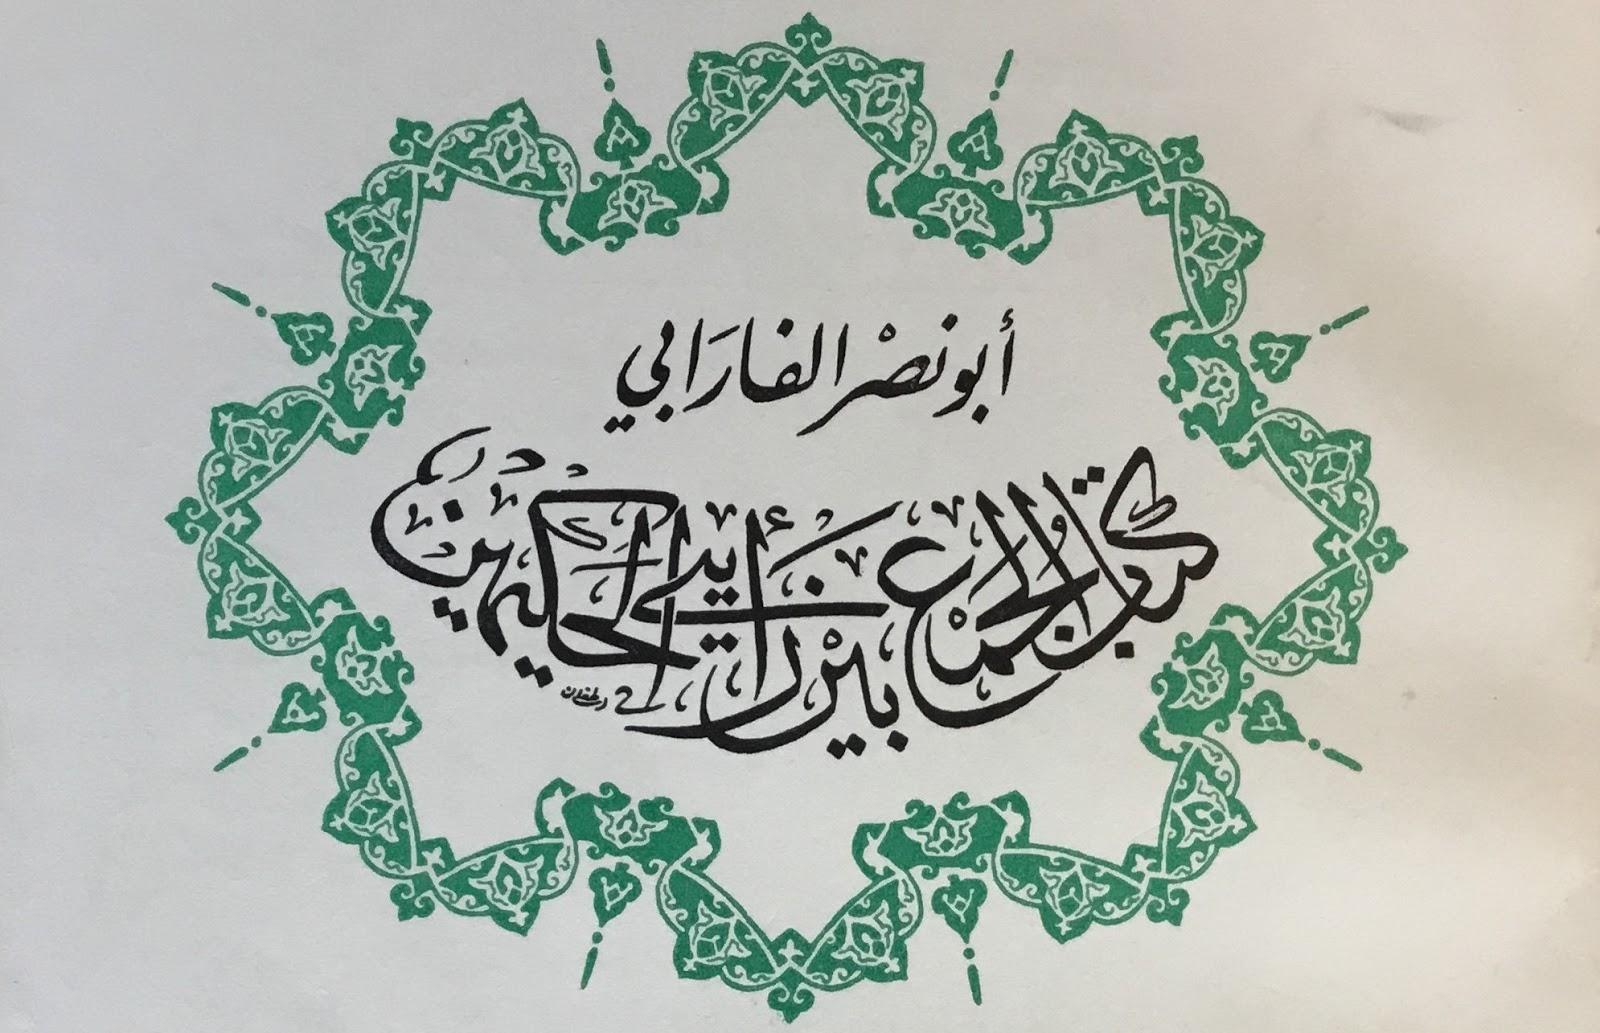 Kitab al-Jami' dalam Ilmu Hadis